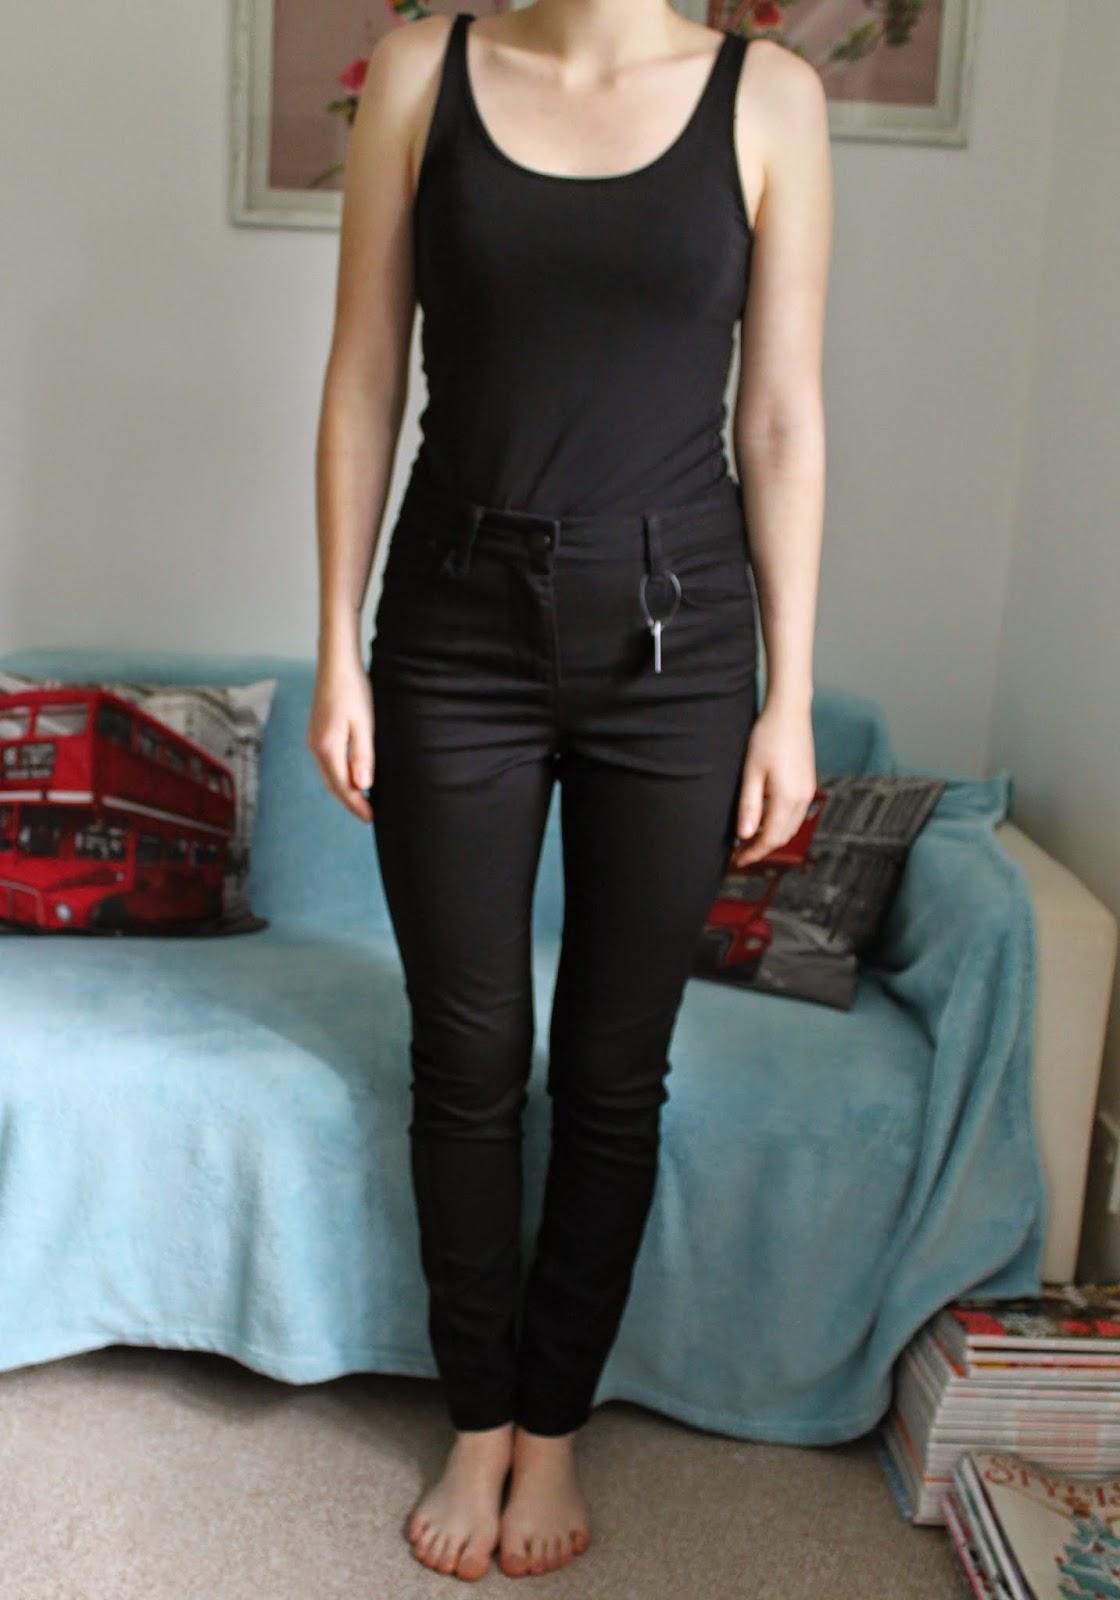 Marks and Spencer Black Skinny Jeans